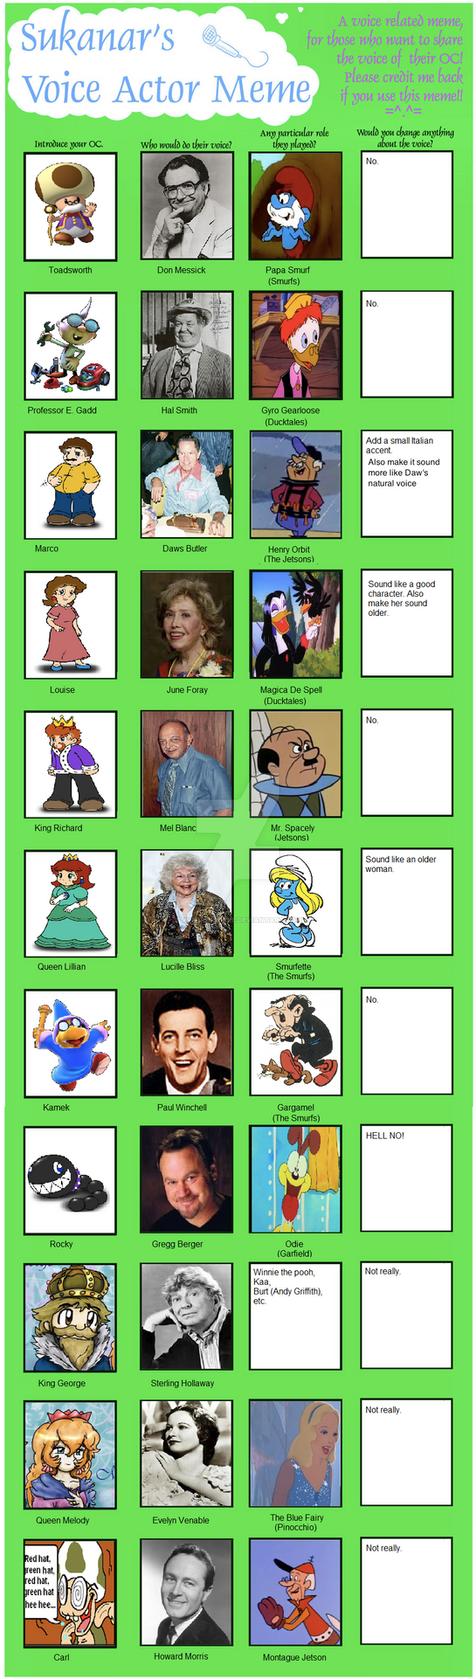 Mario Bros: FC meme w/ vintage VAs by mrbill6ishere